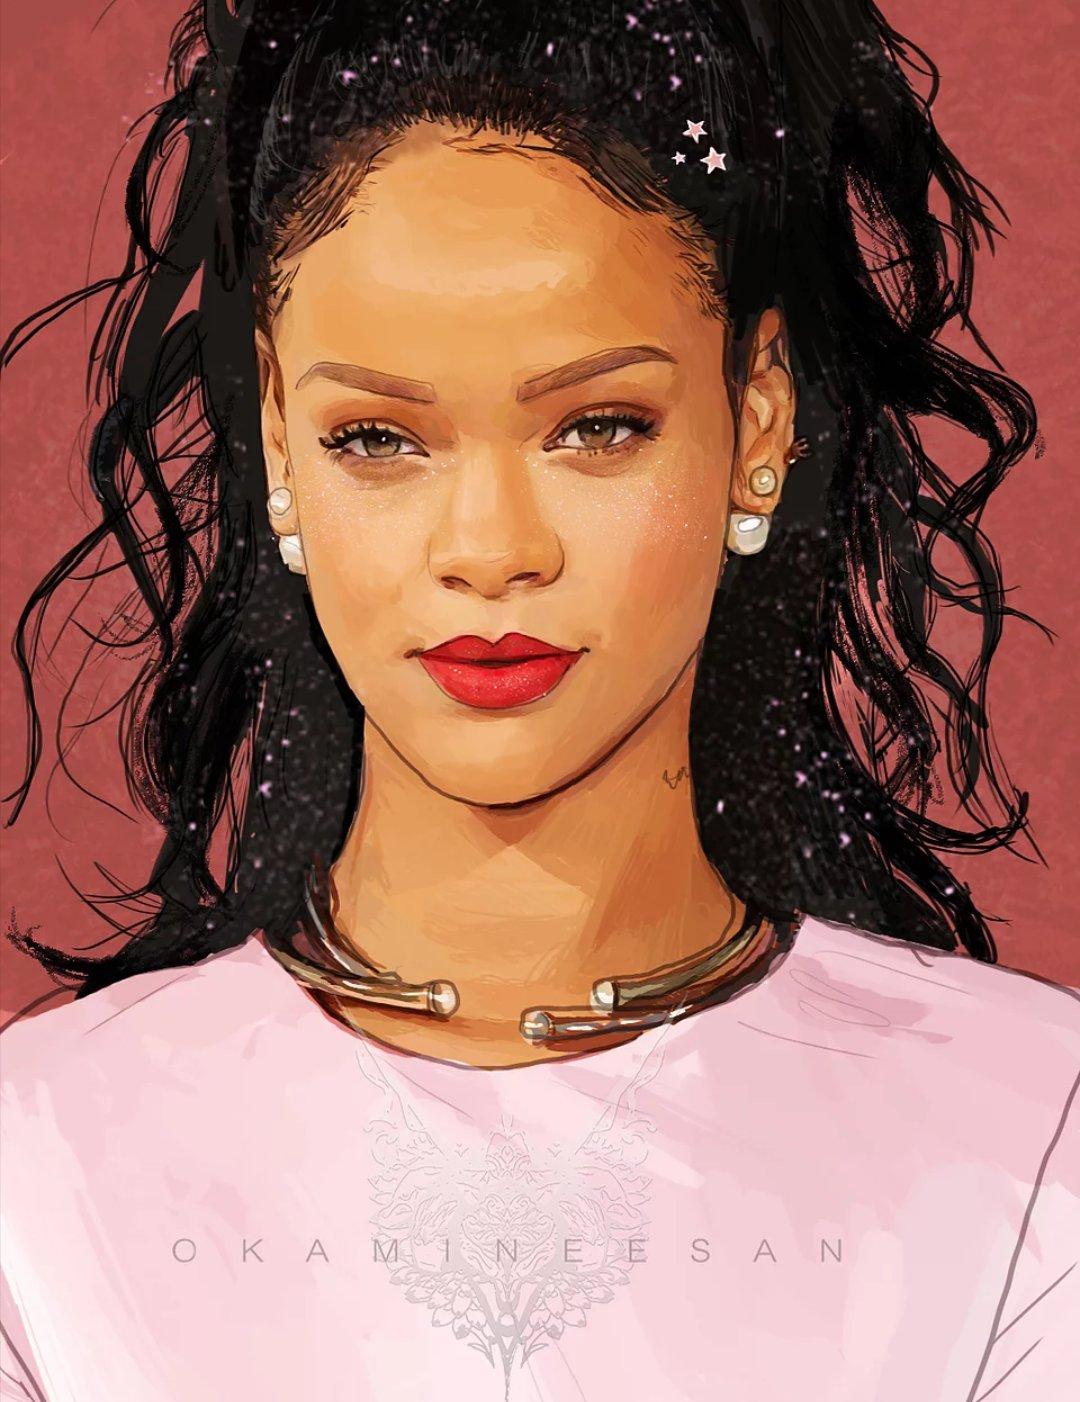 My digital art of the beautiful Rihanna! Happy belated birthday!